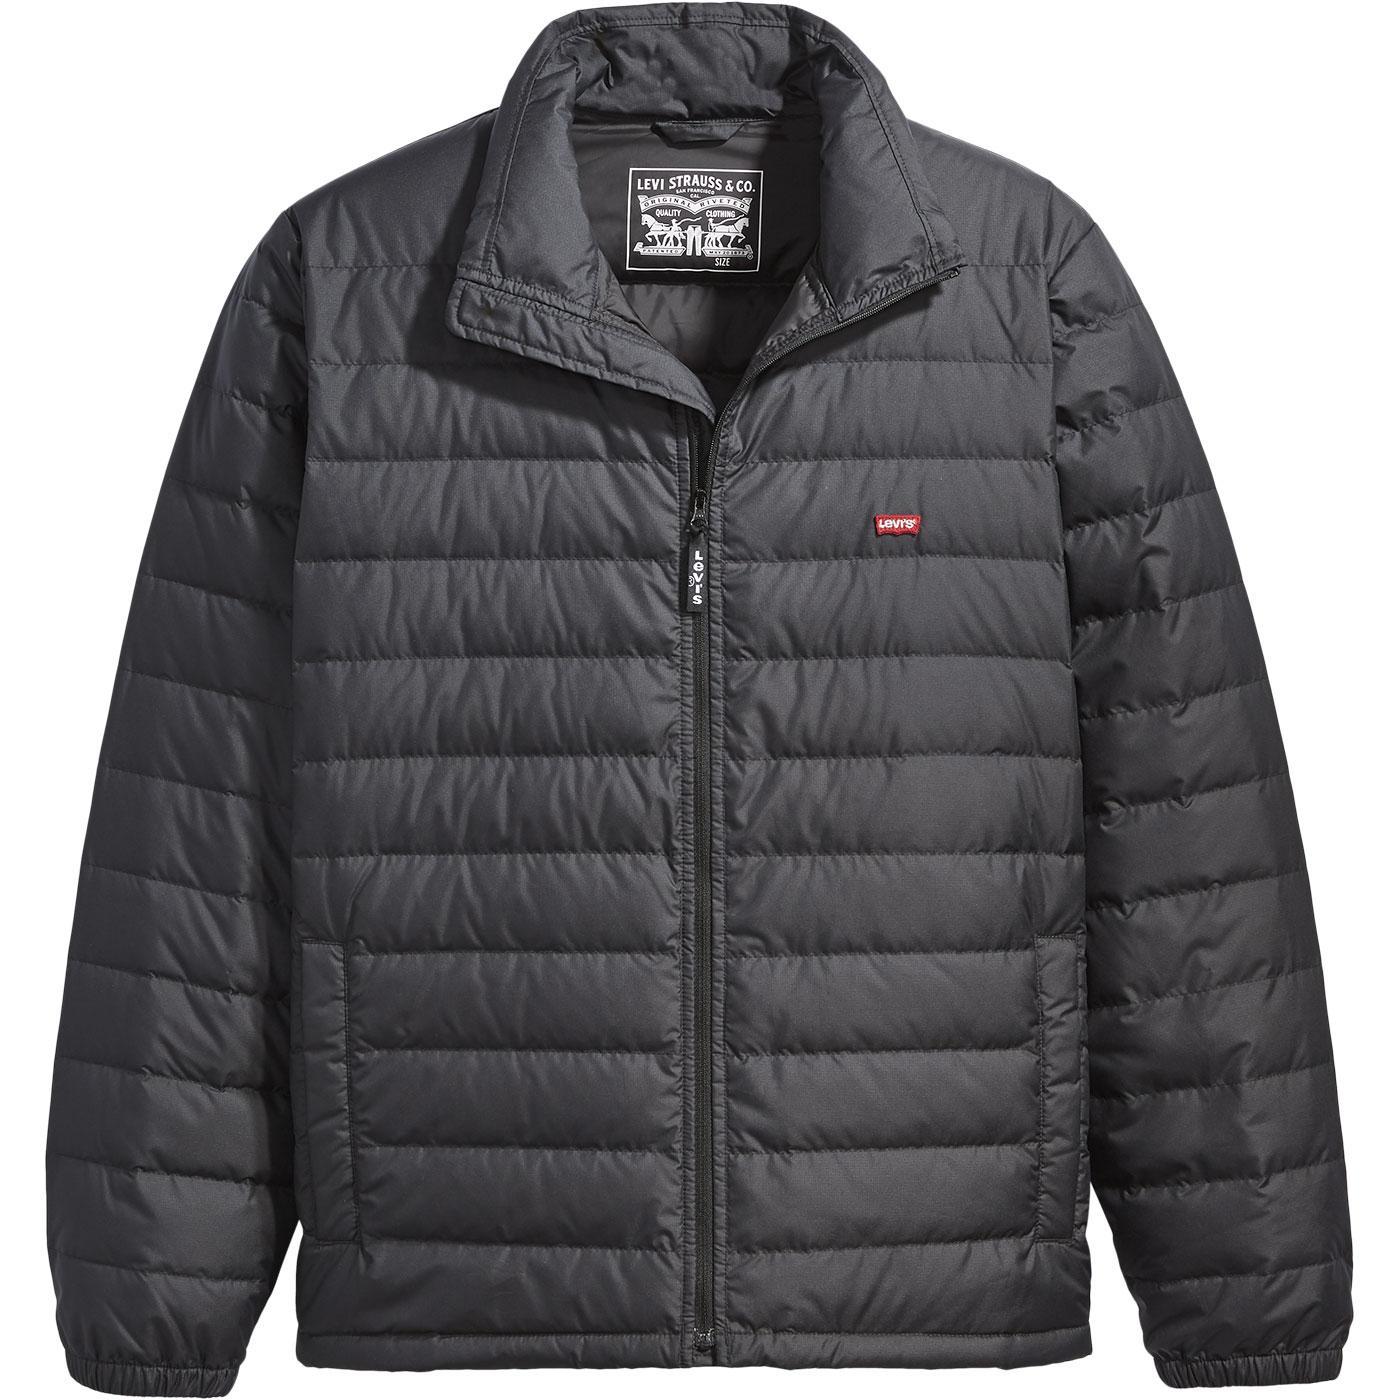 LEVI'S Down Dehon Puffer Jacket - Mineral Black